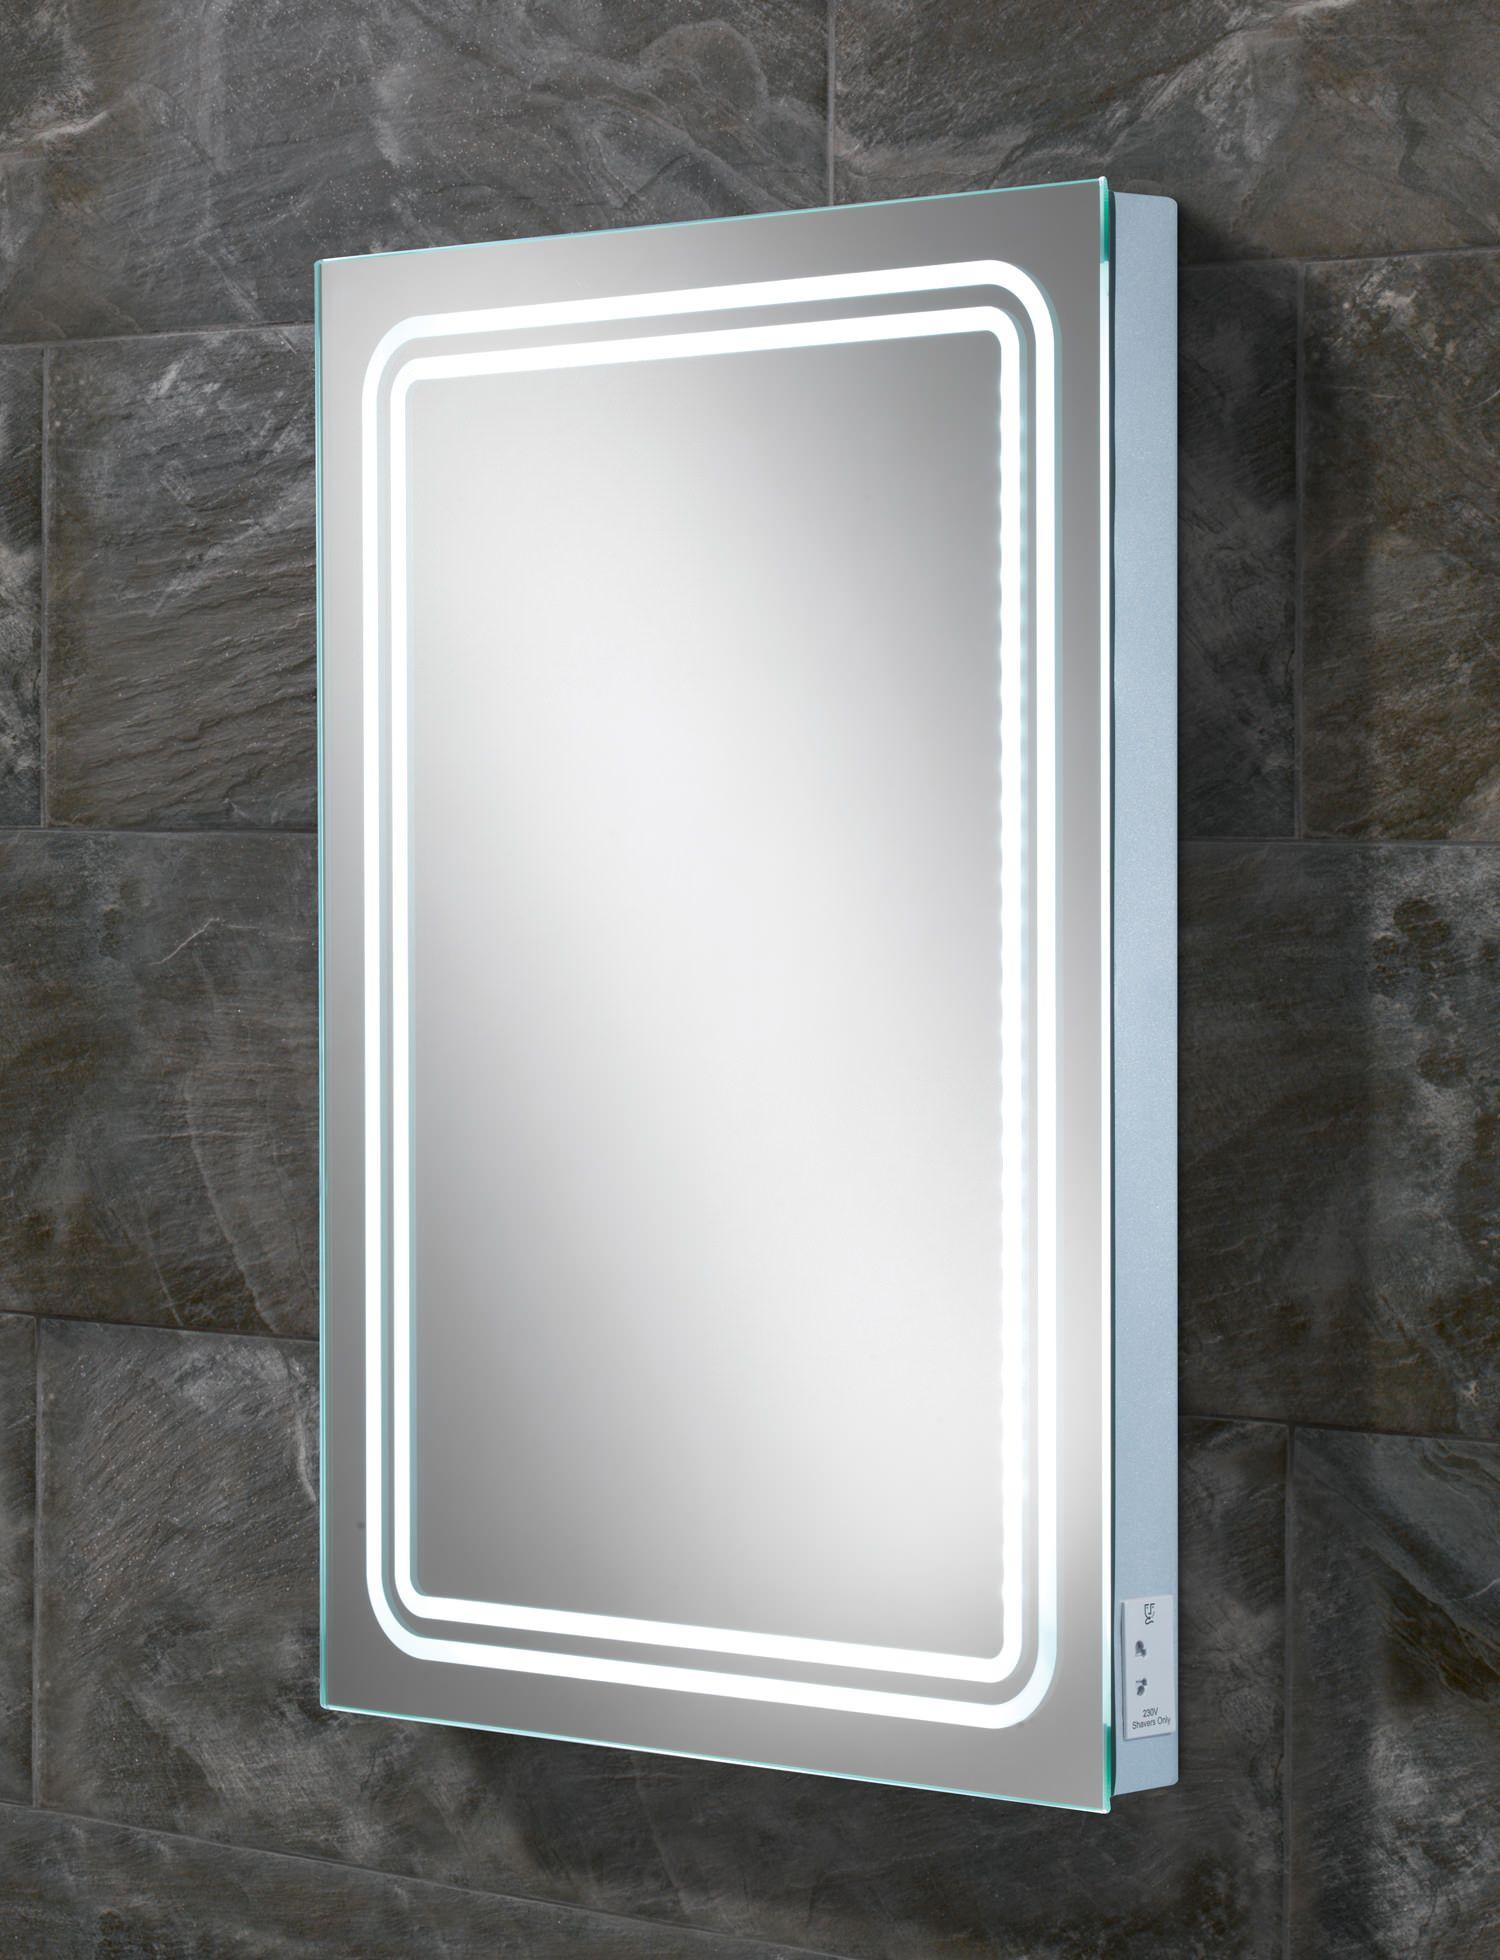 HIB Rotary LED Back-Lit Mirror With Shaver Socket - 77416000   En ...